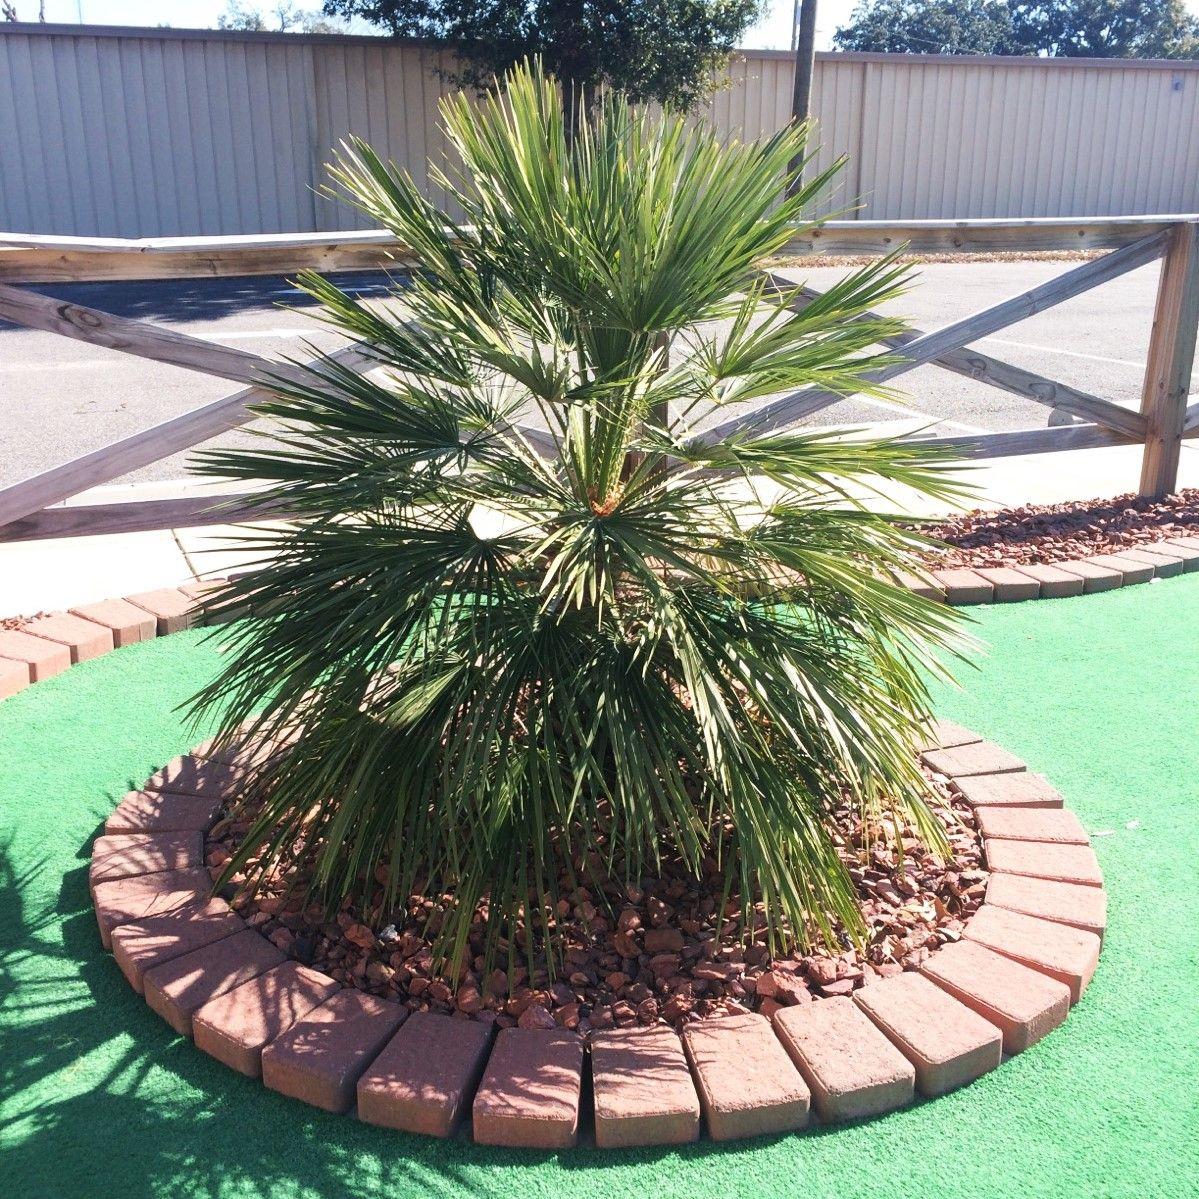 Mediterranean Fan Palm Tree Buy At Nature Hills Nursery